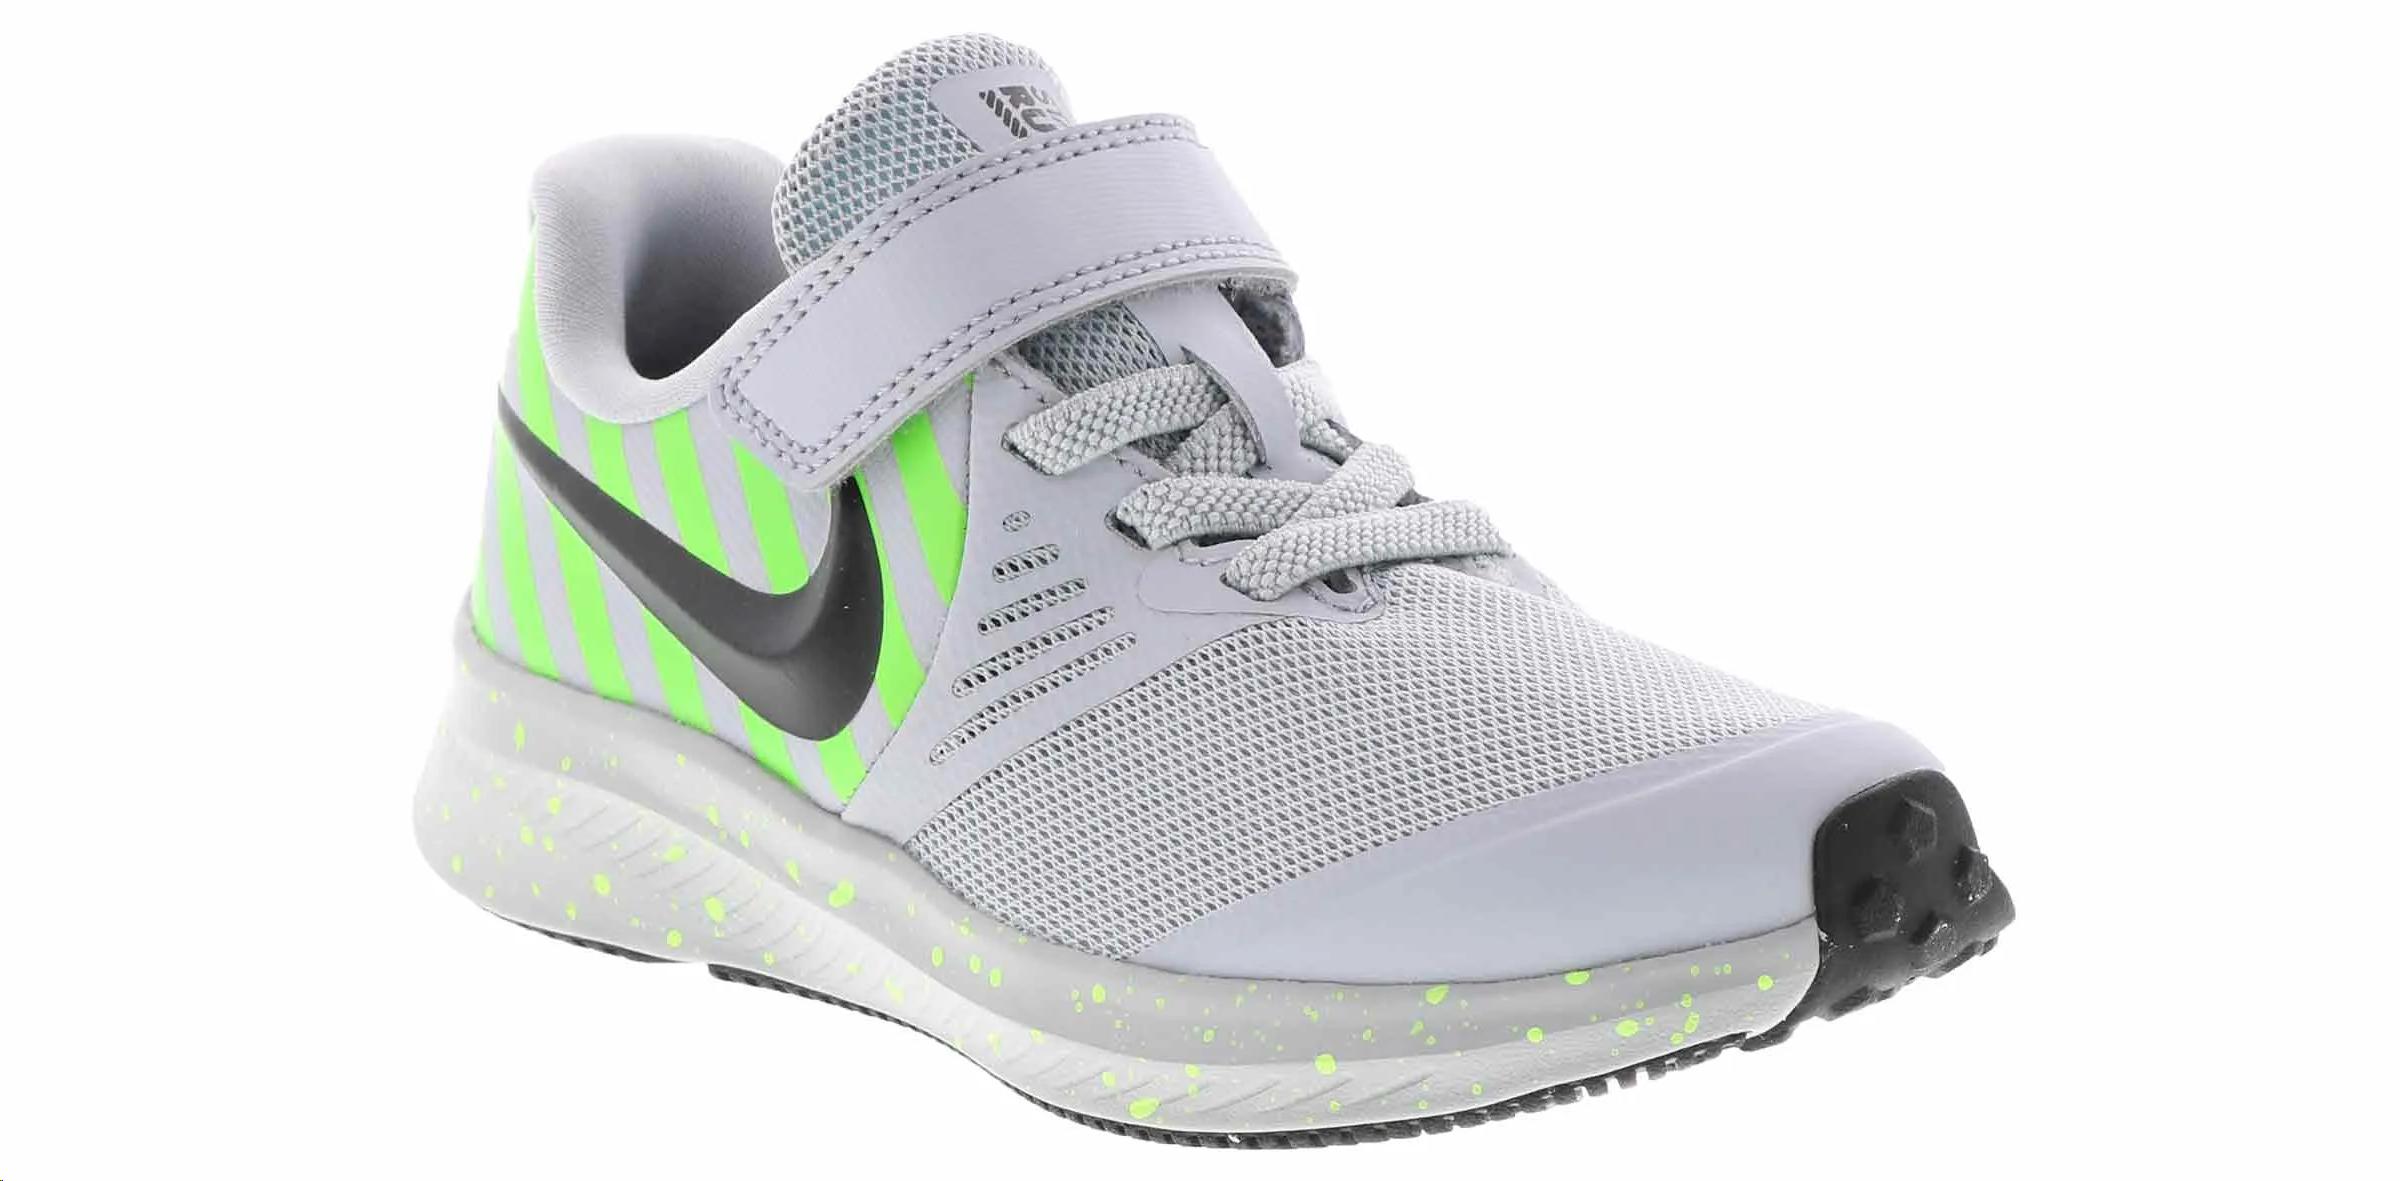 Zapatillas Nike Star Runner 2 Sport gris niño Deportes Moya